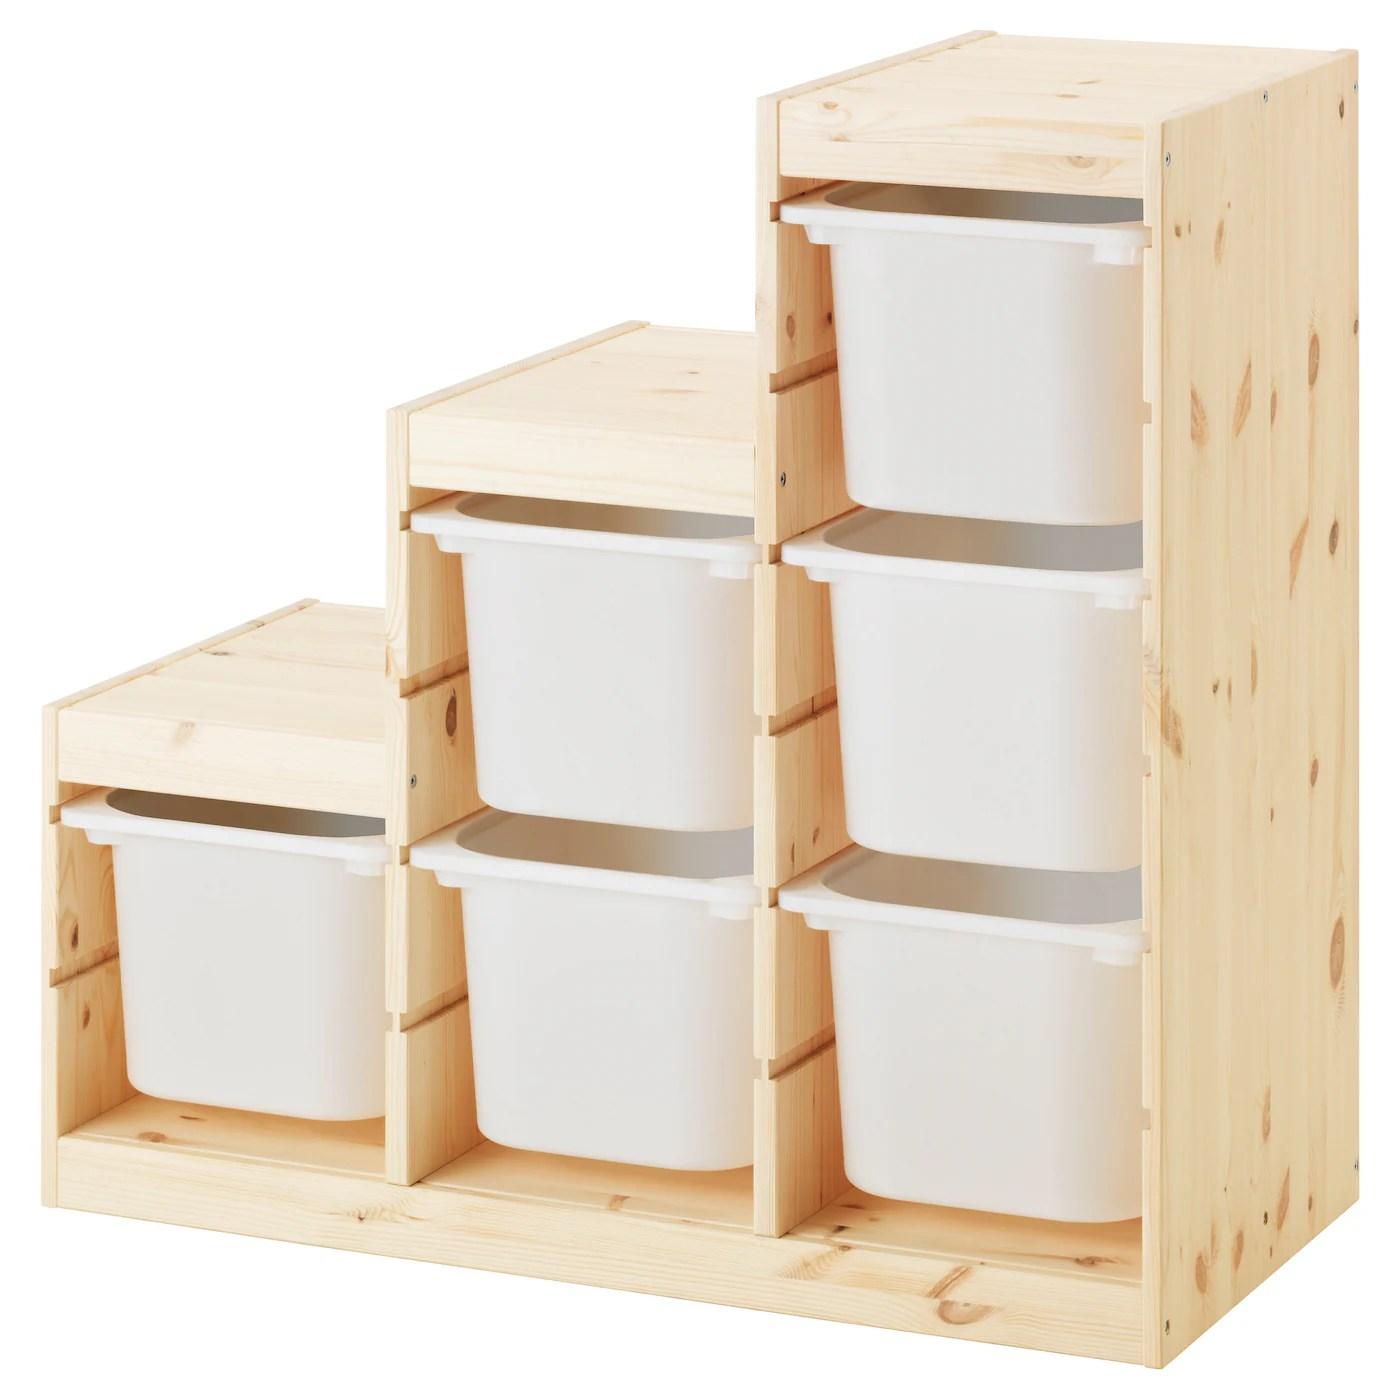 trofast storage combination light white stained pine white 37x17 3 8x35 7 8 94x44x91 cm